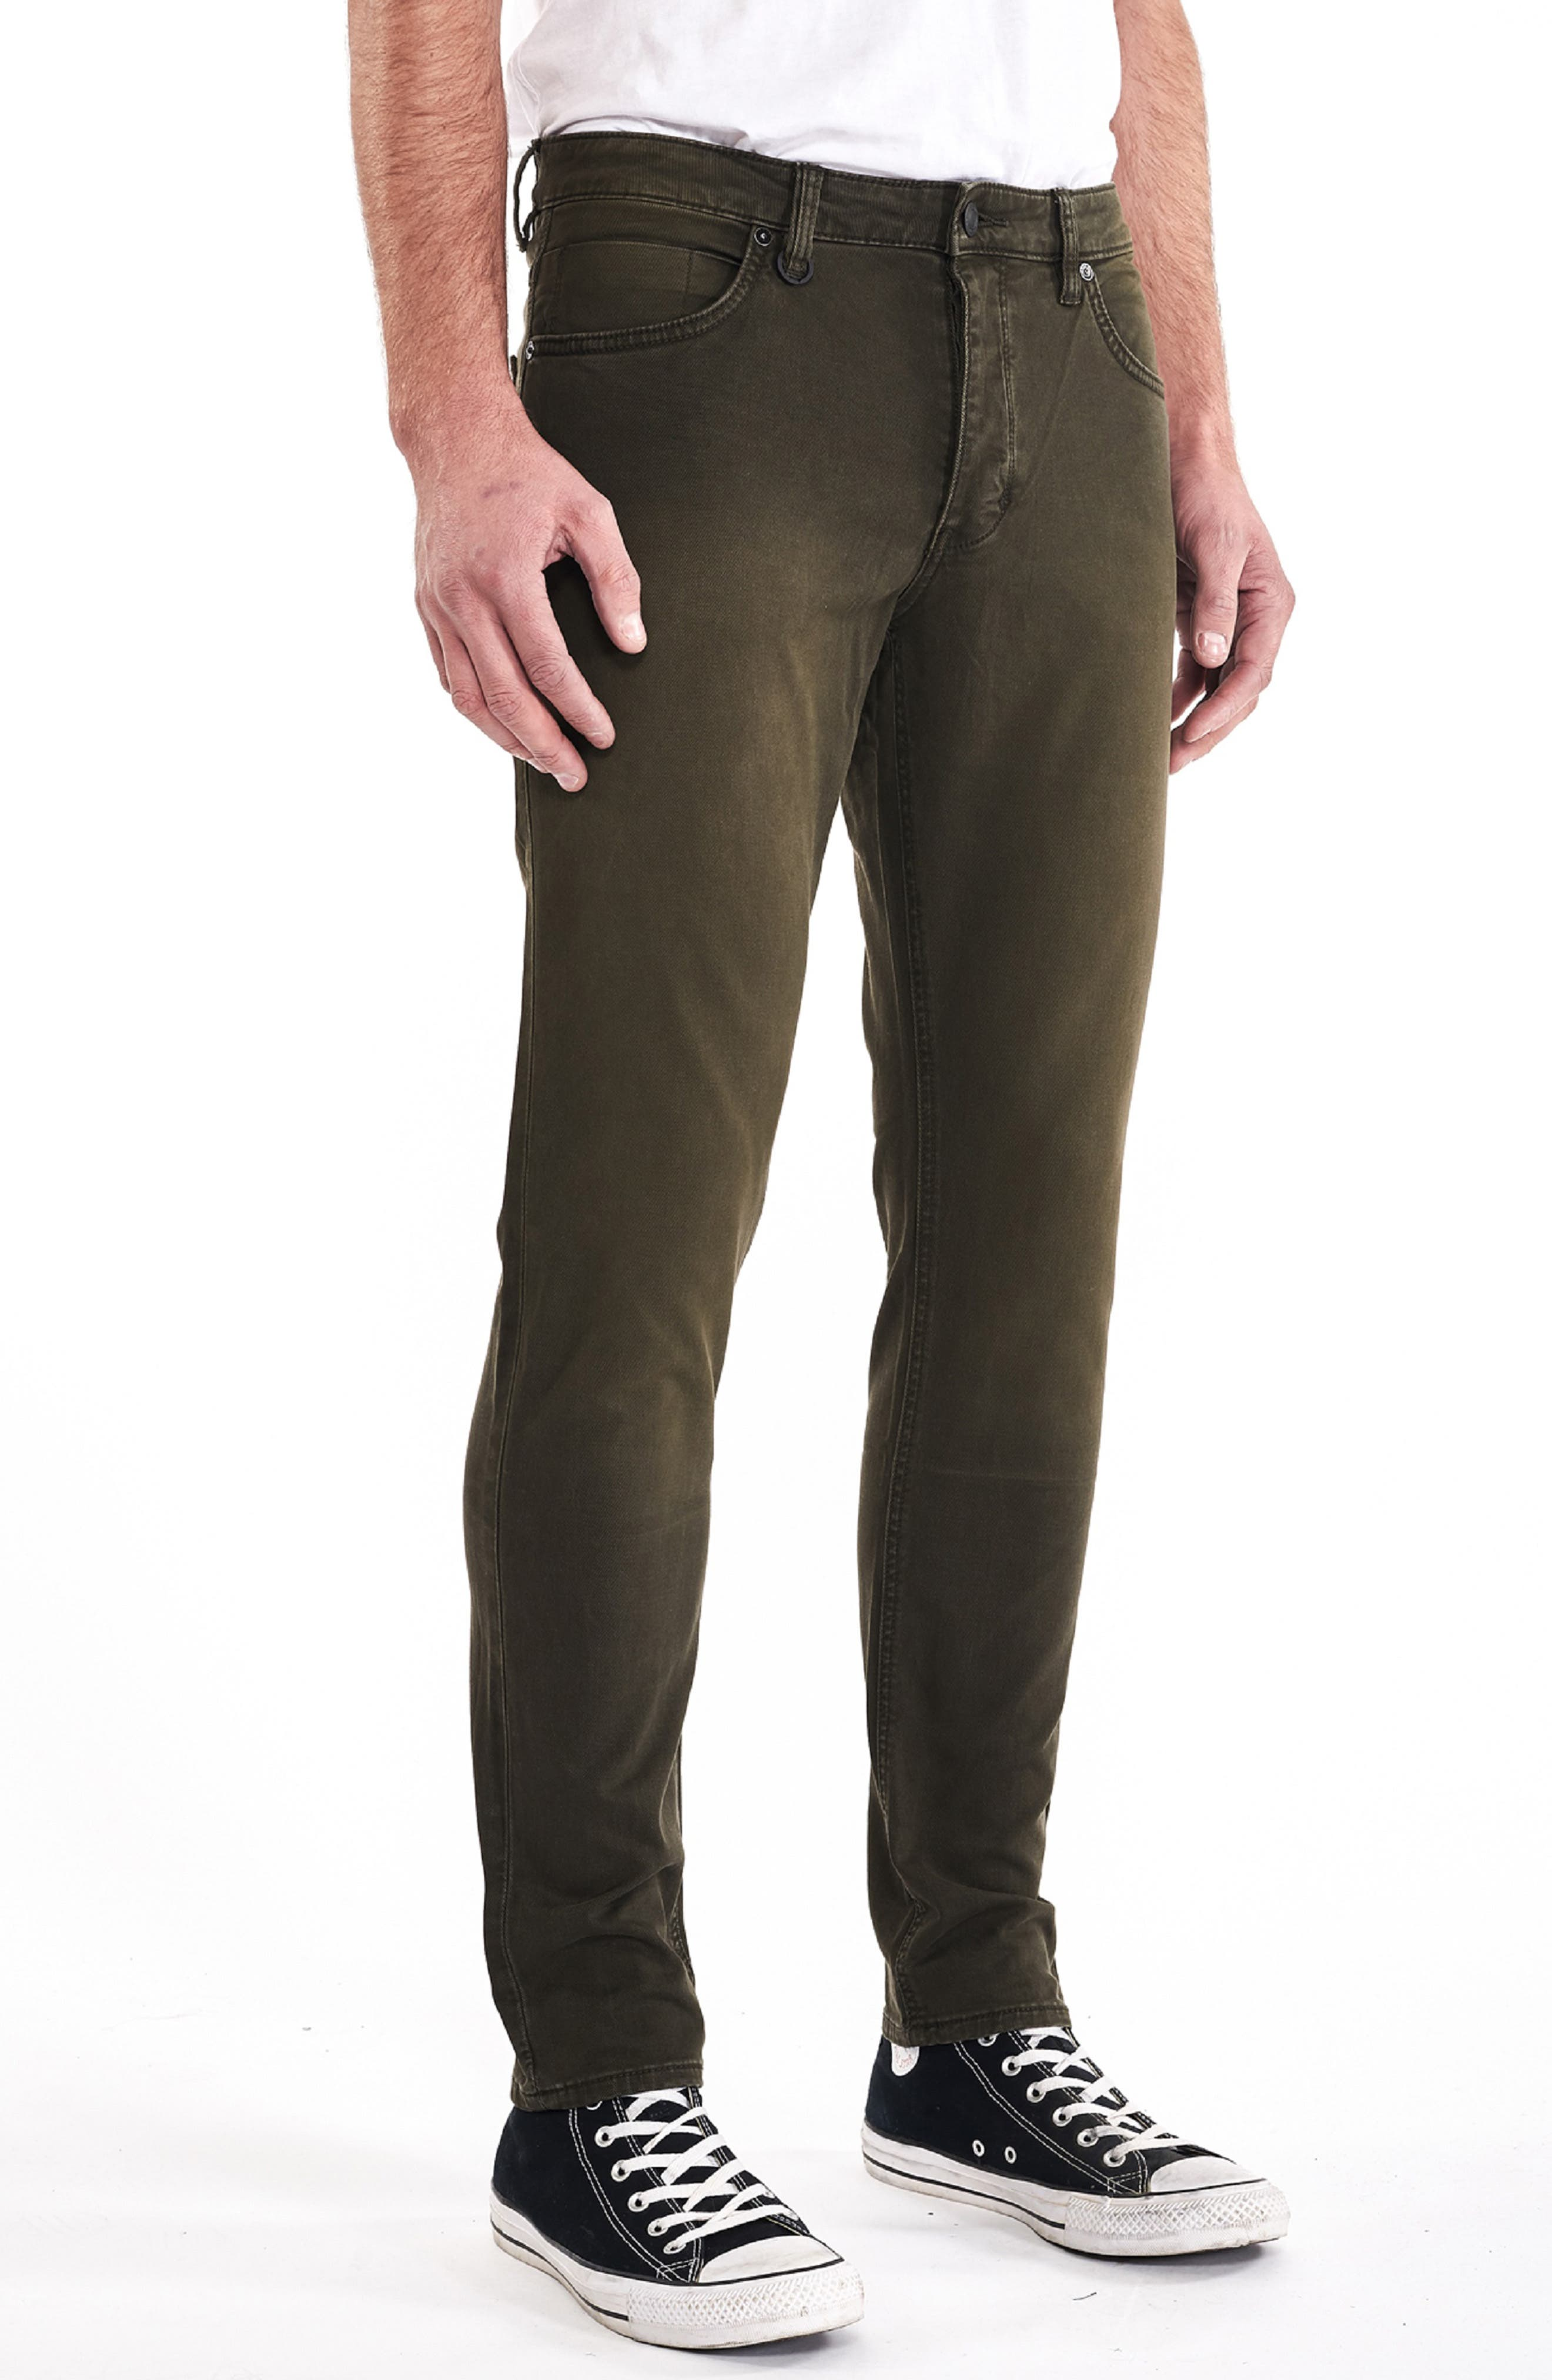 Lou Slim Fit Jeans,                             Alternate thumbnail 3, color,                             ARMAGEDDON GREEN